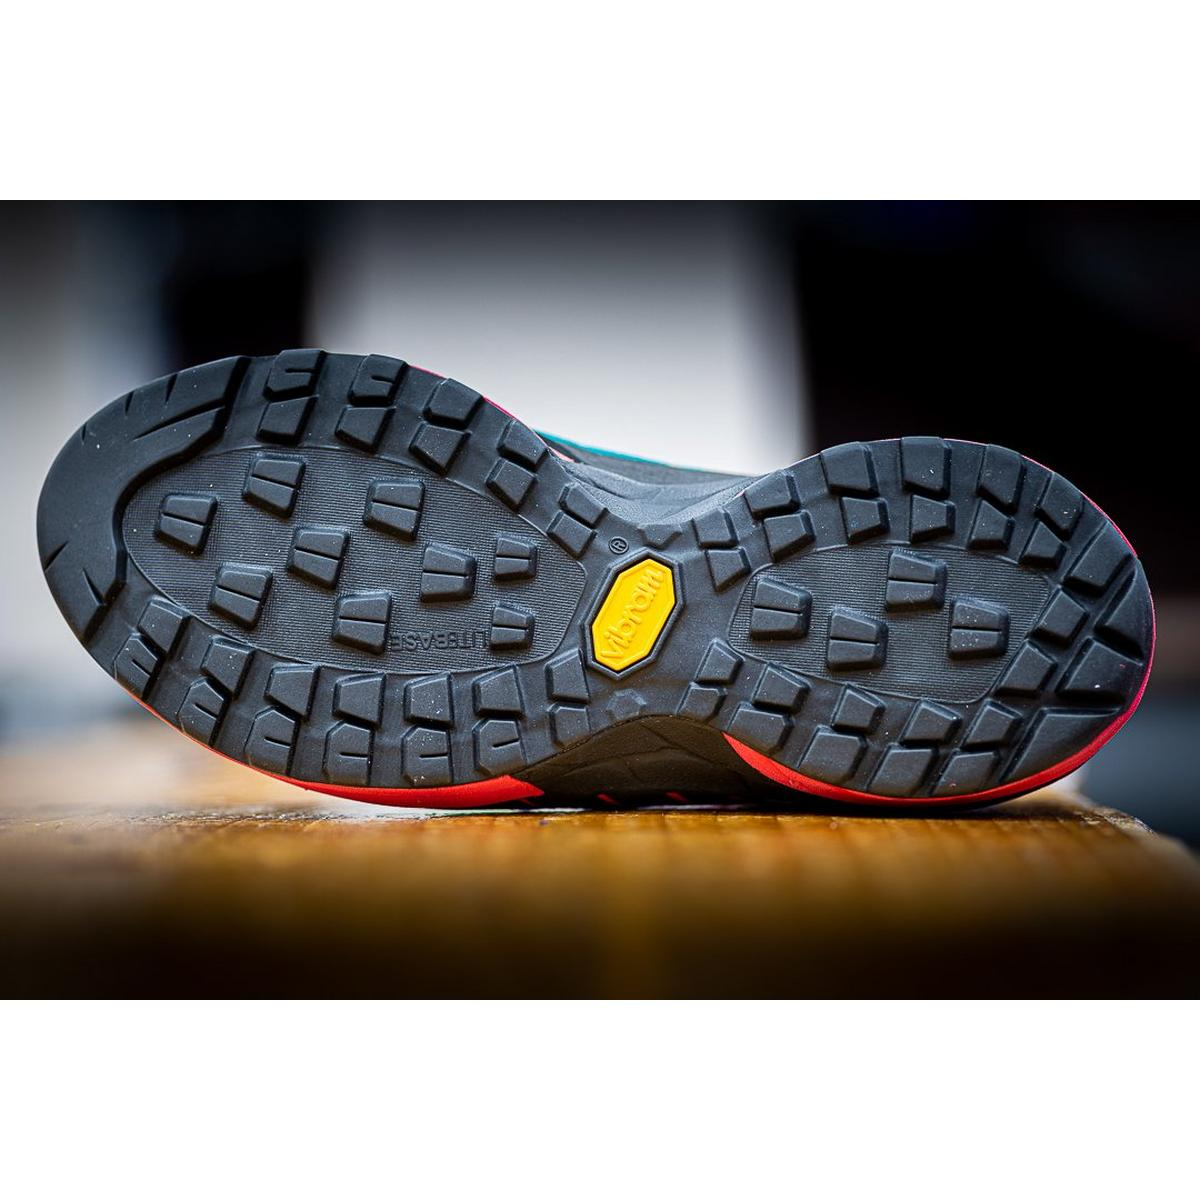 Scarpa Women's Mescalito Shoe